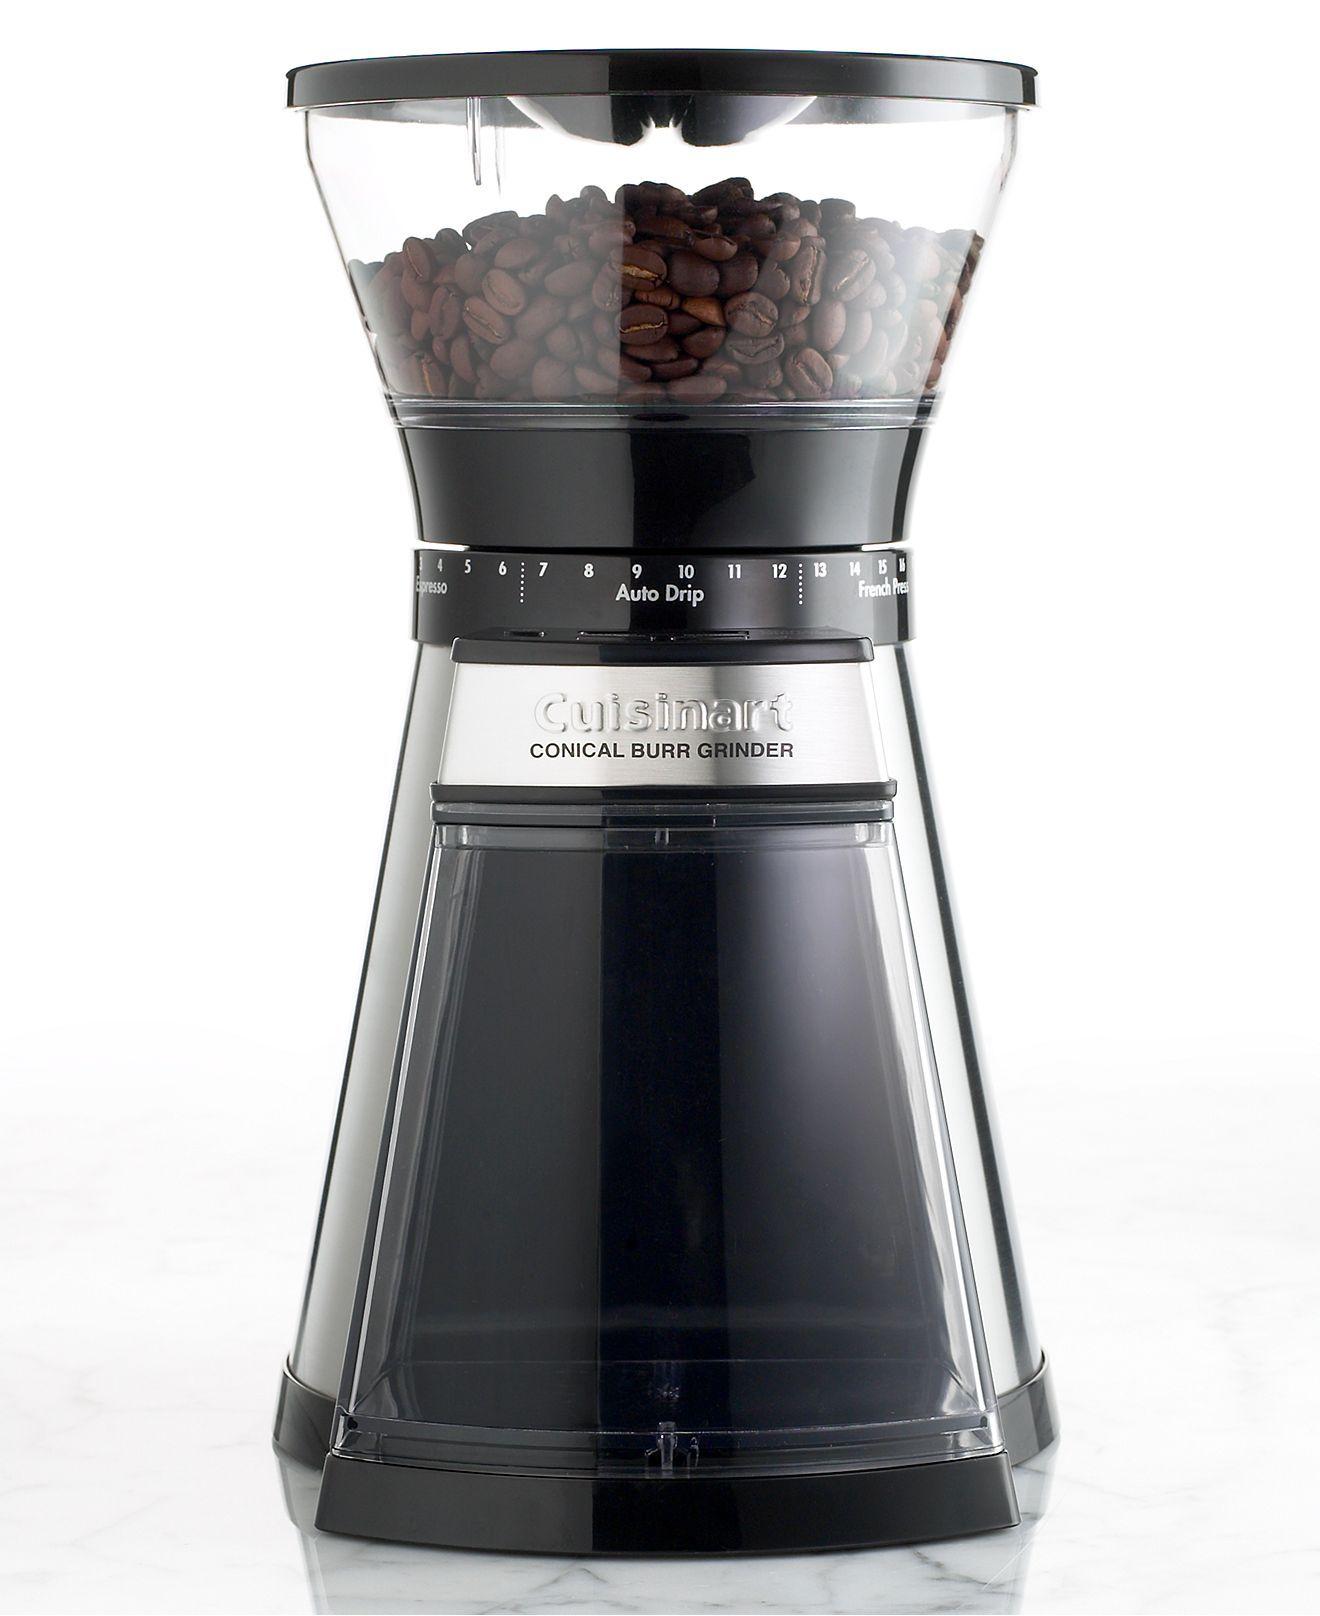 Cuisinart cbm18 conical burr programmable coffee grinder